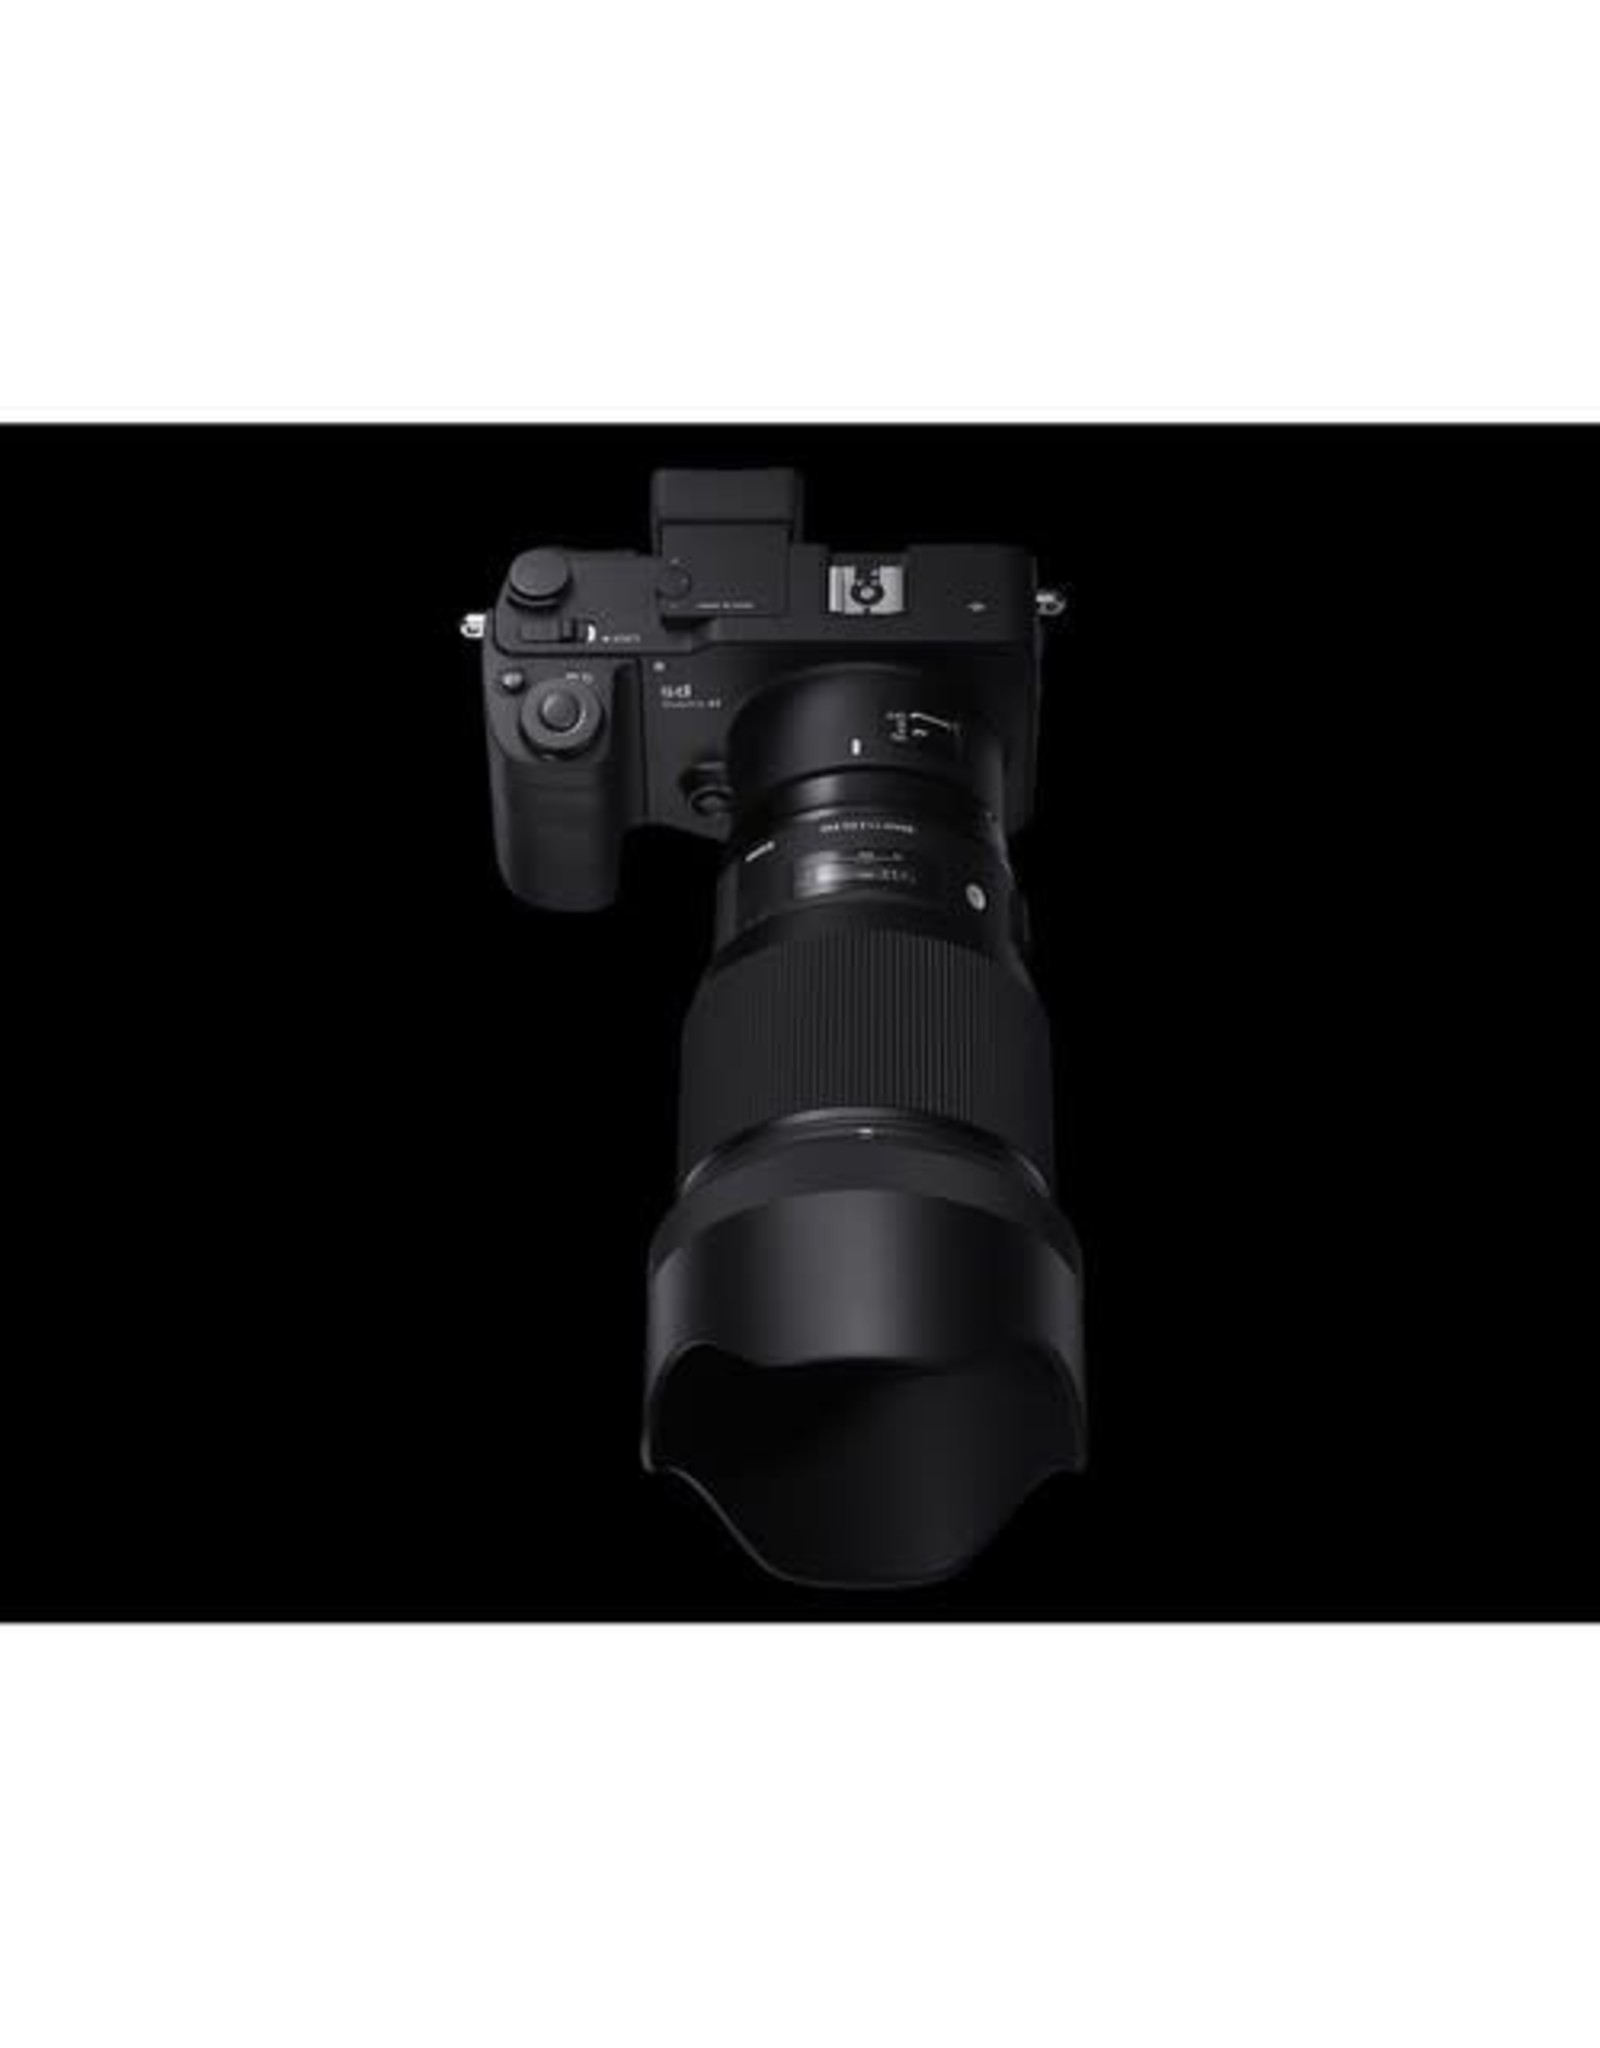 Sigma Sigma 85mm f1.4 Art DG HSM (Specify Mount Type)